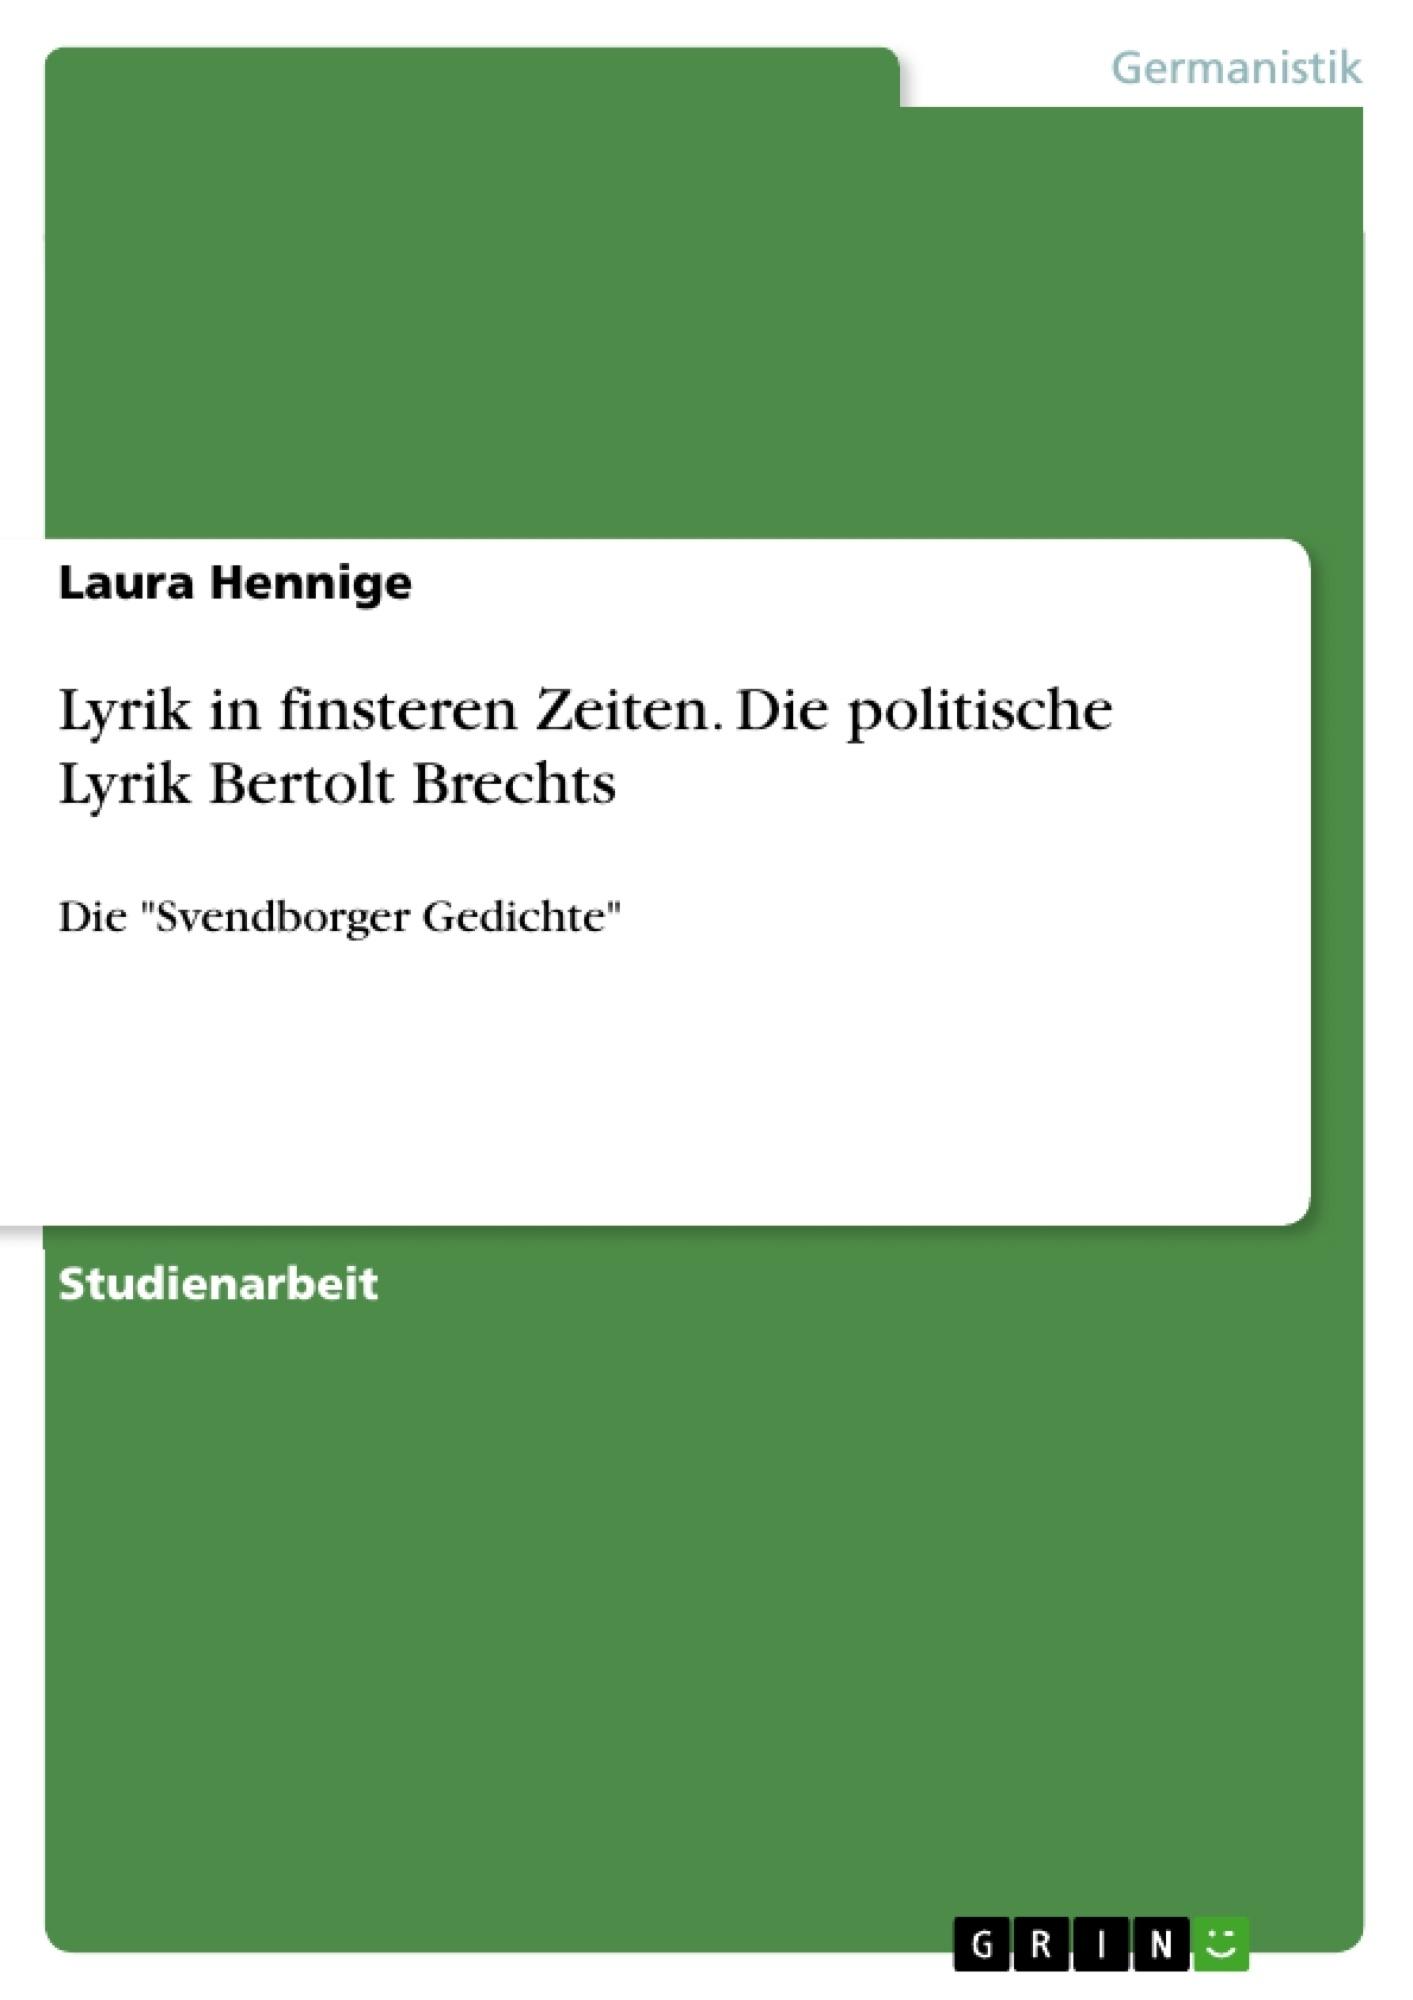 Titel: Lyrik in finsteren Zeiten. Die politische Lyrik Bertolt Brechts